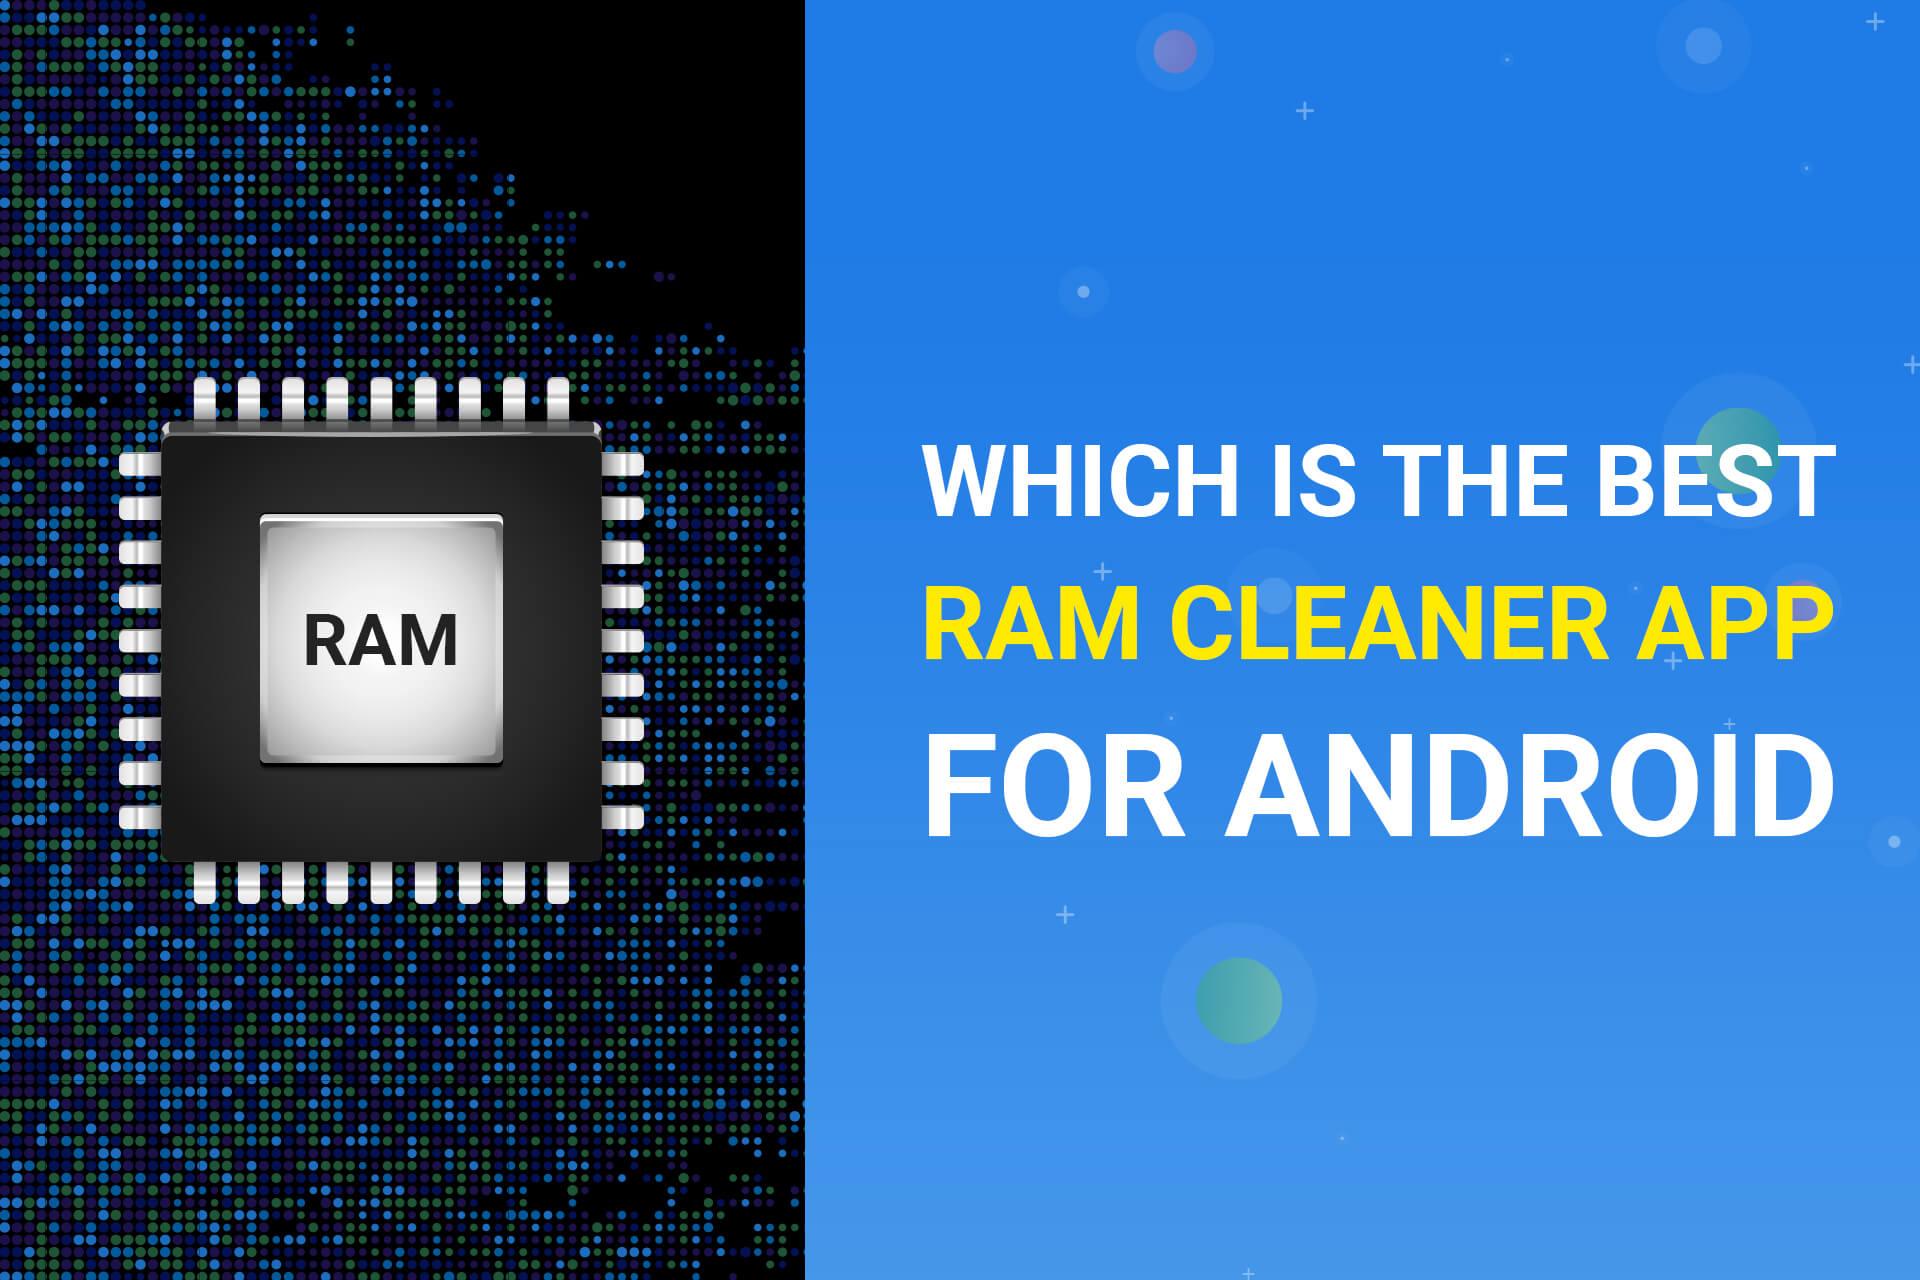 best-ram cleaner-app